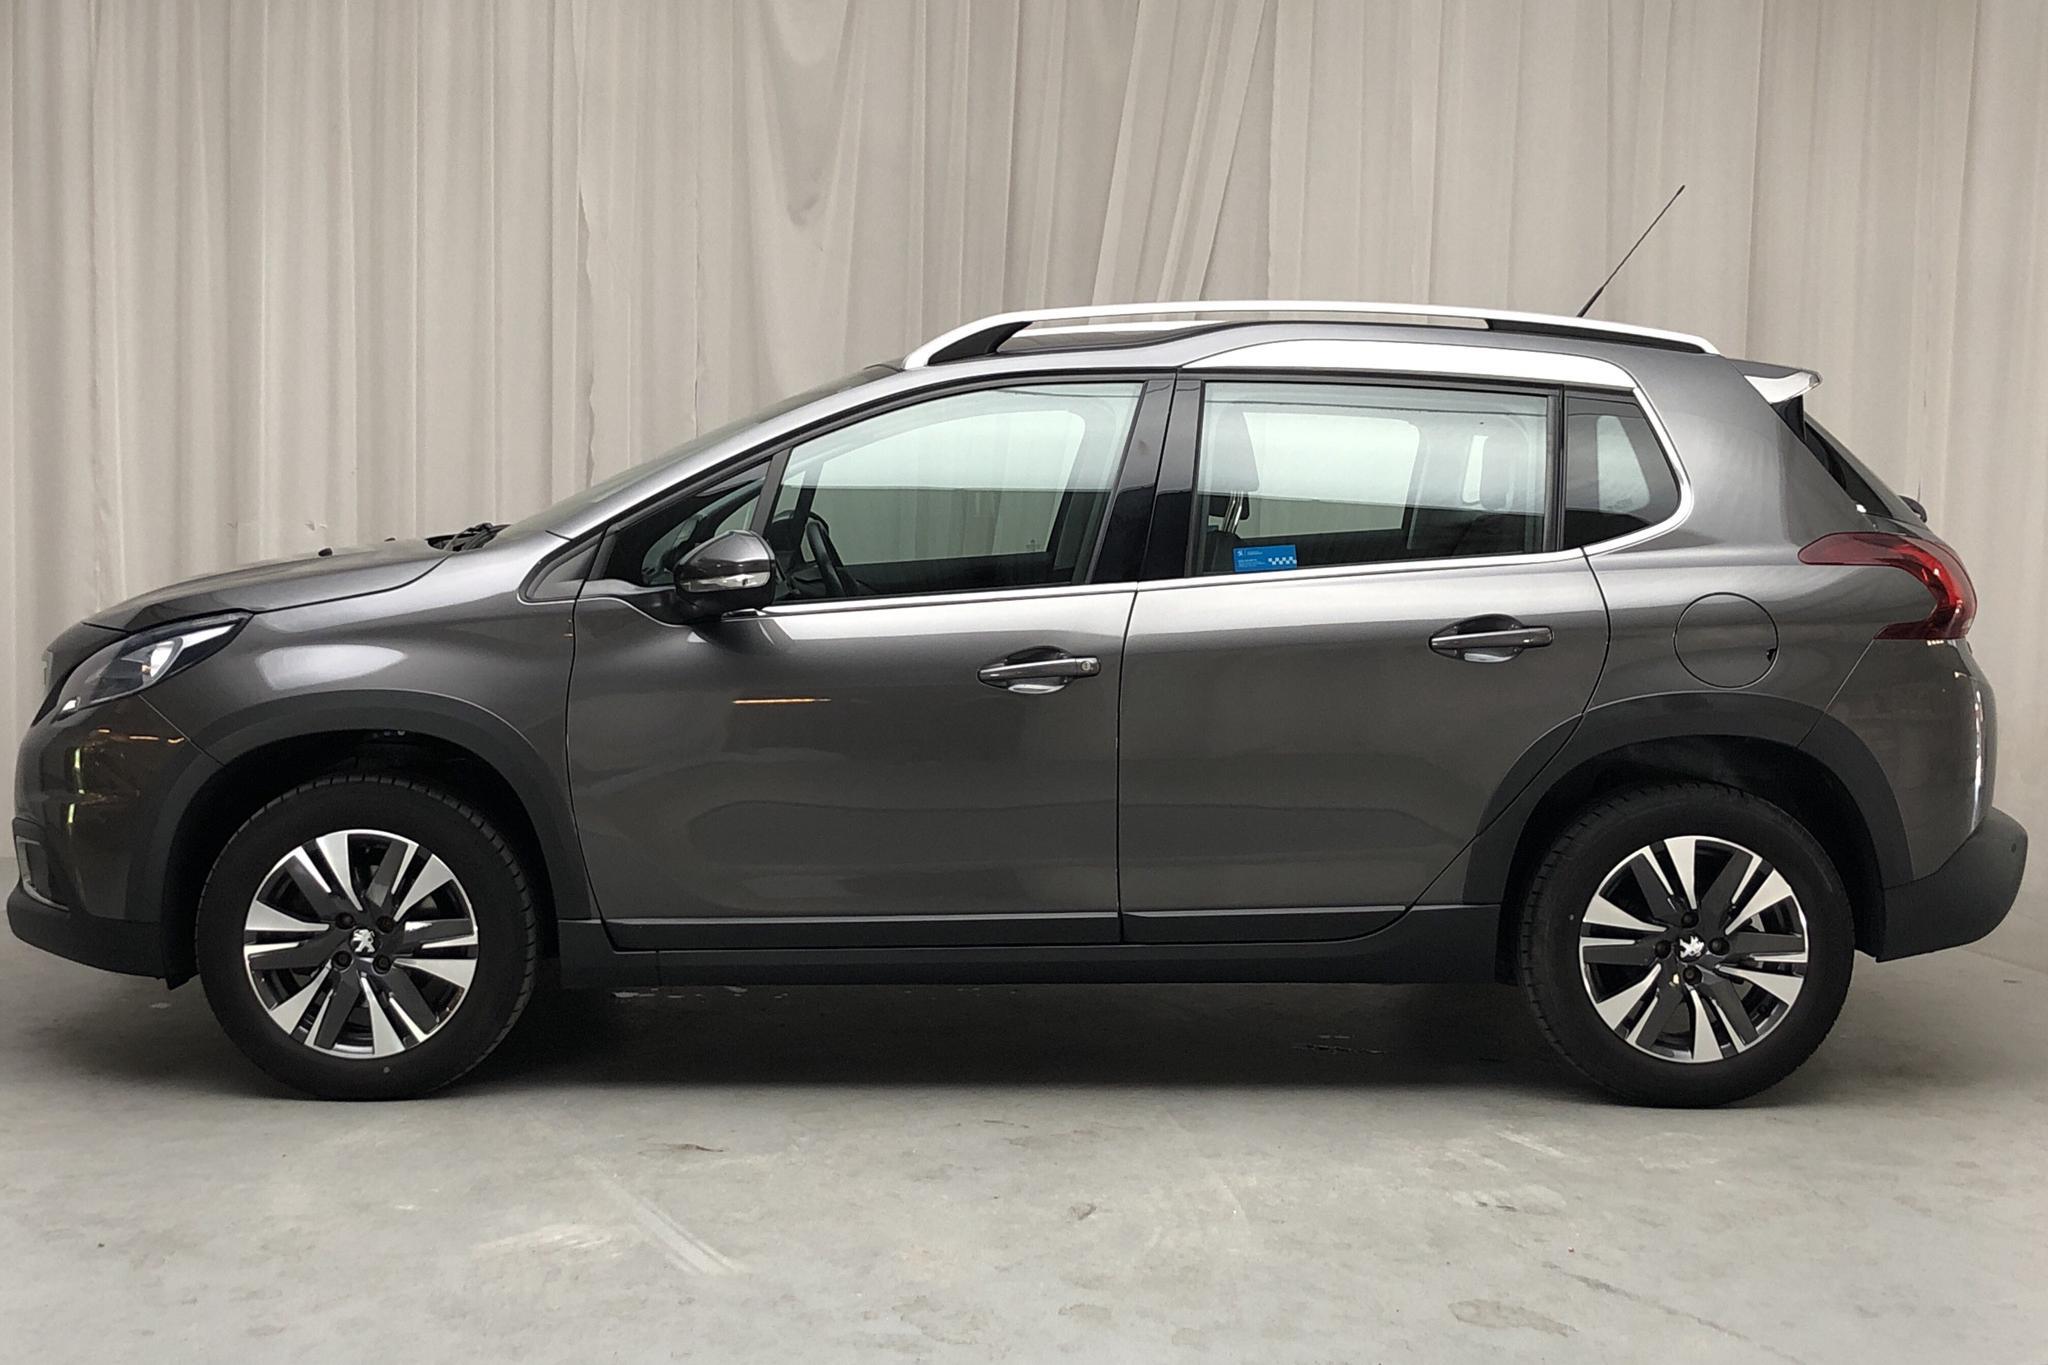 Peugeot 2008 1.2 PureTech (110hk) - 2 516 mil - Automat - Dark Grey - 2018